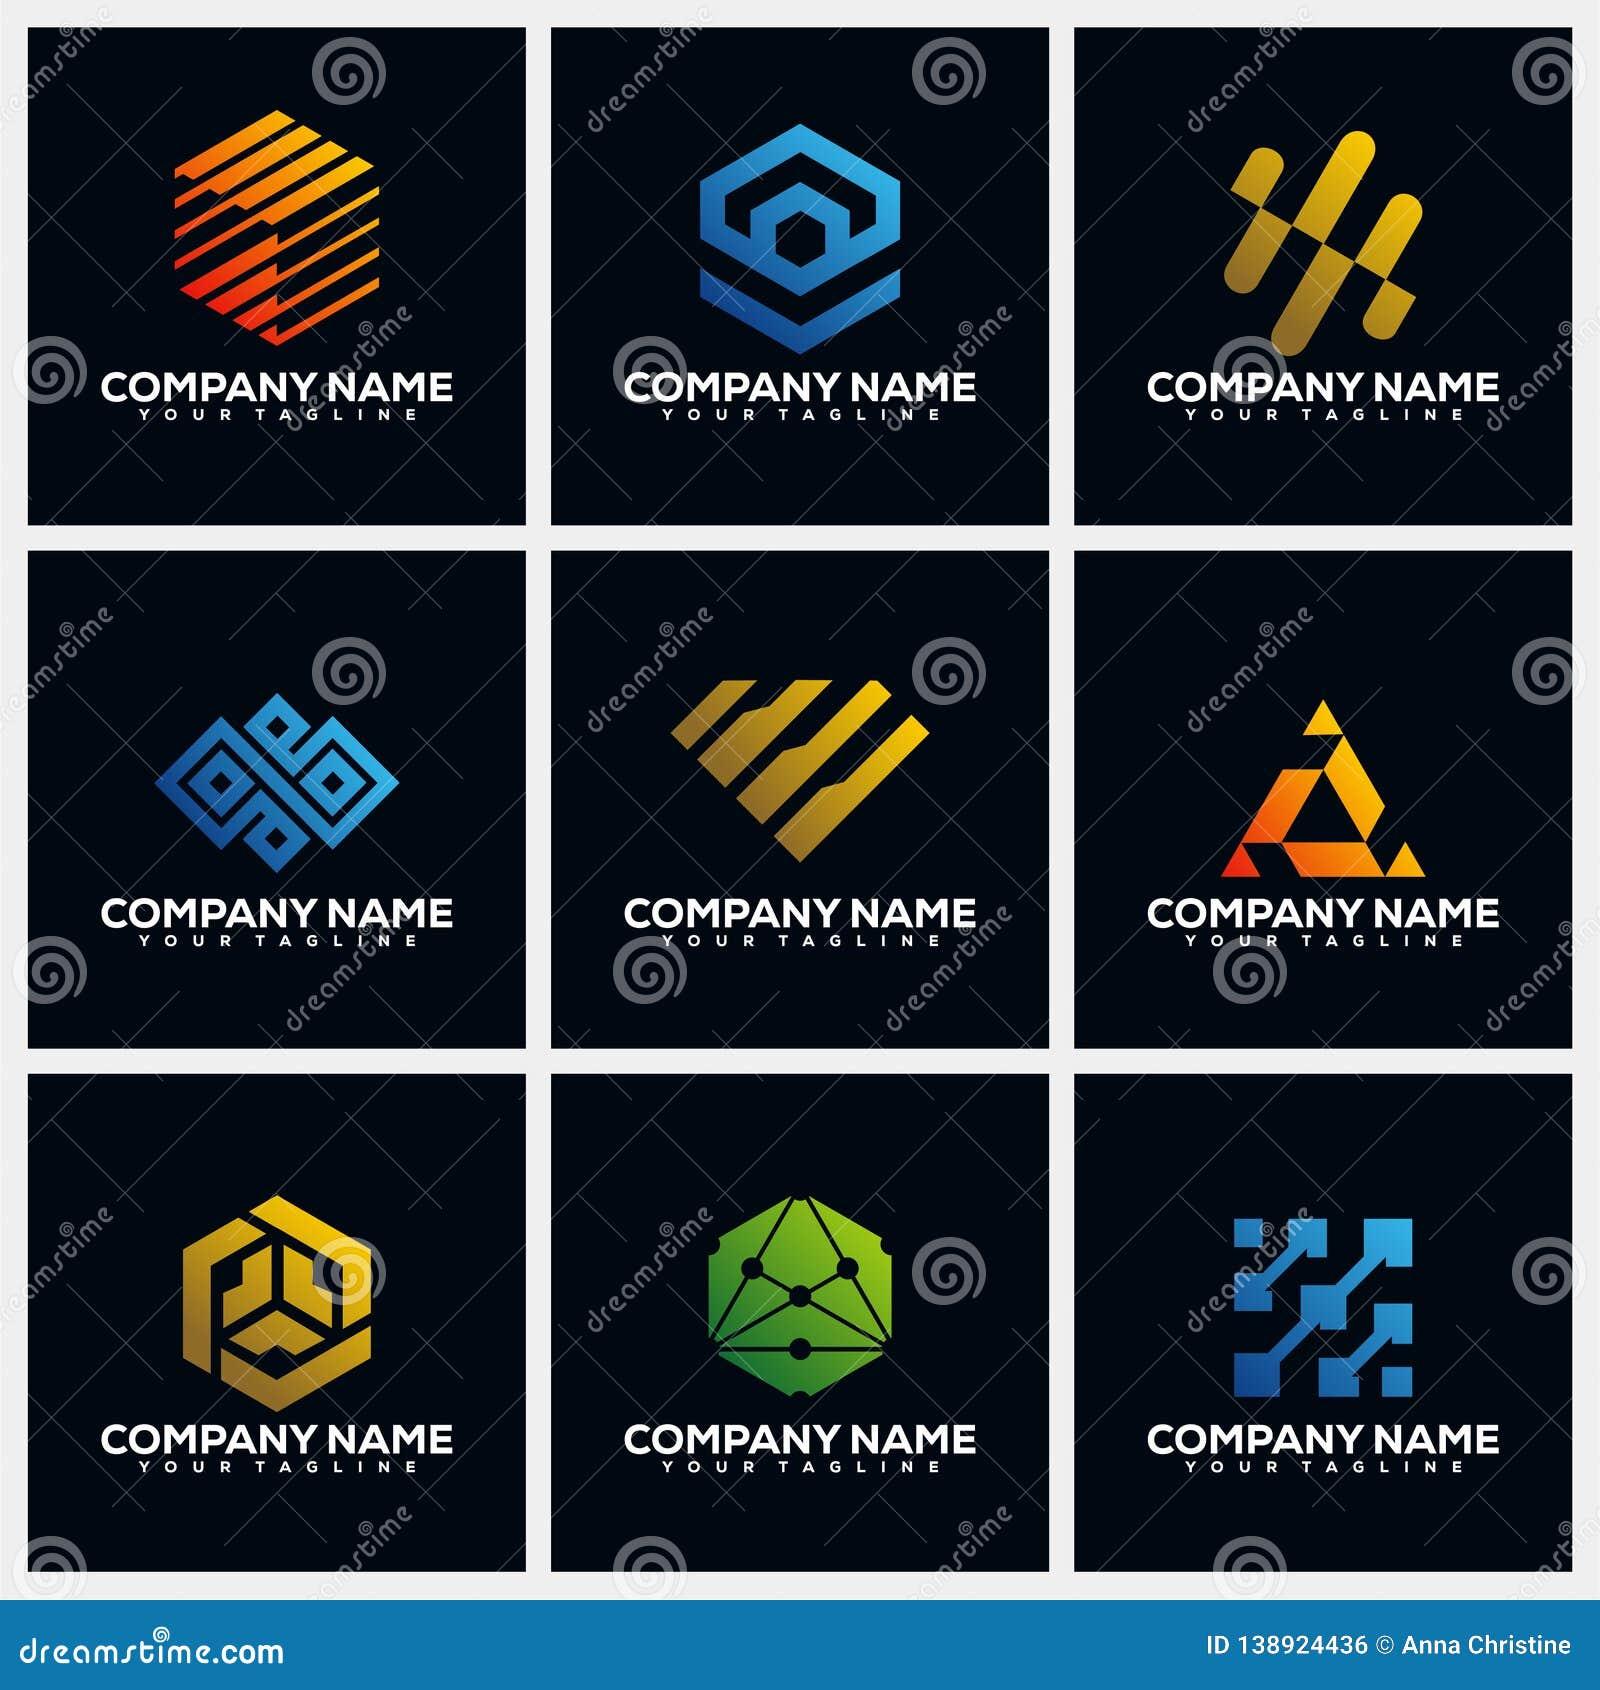 Abstract Pack Creative Logo Design Concept Vector Template